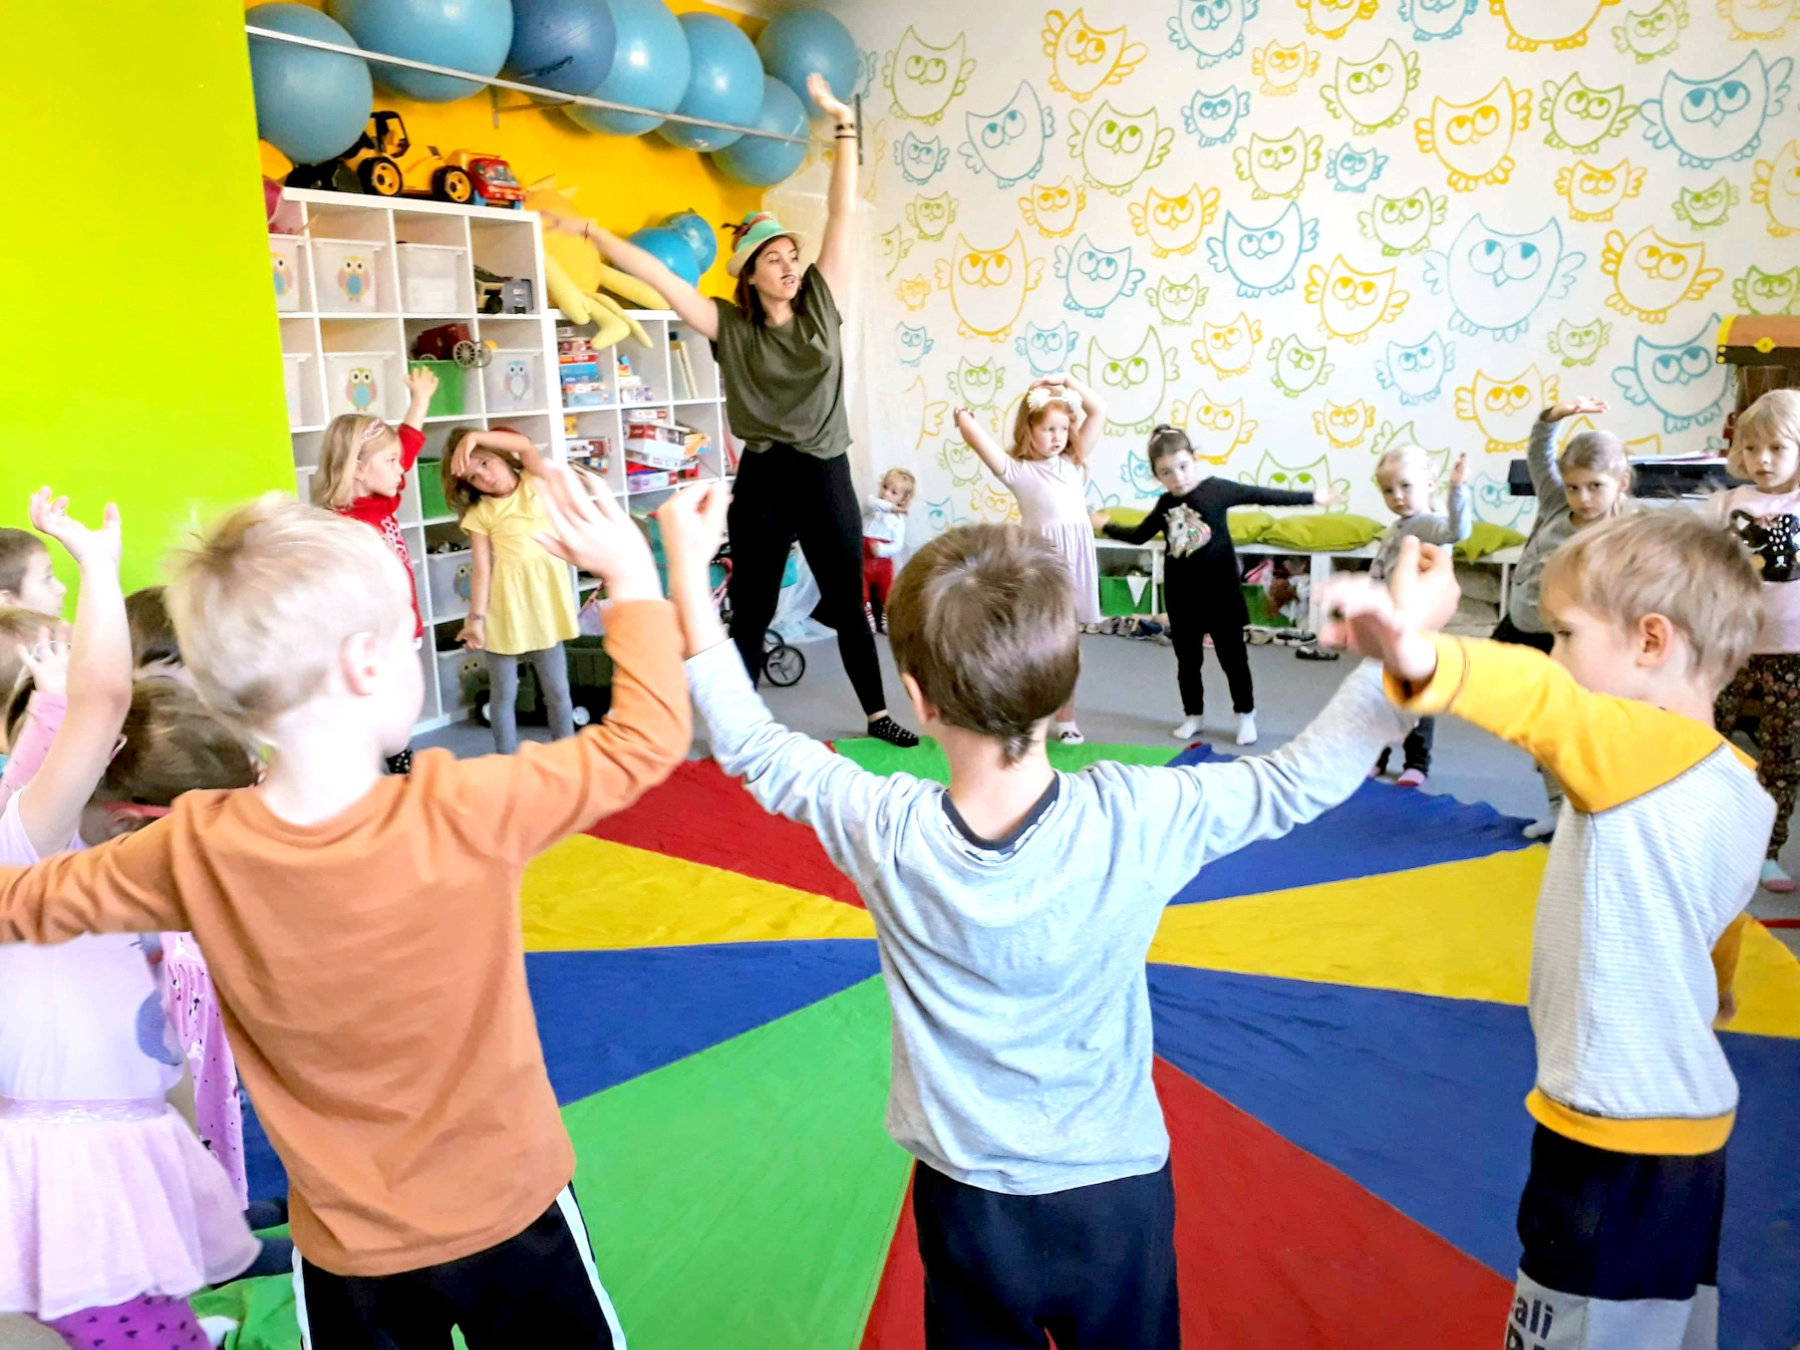 Univerzitka - materska skola Brno - didakticky zacilene cinnosti